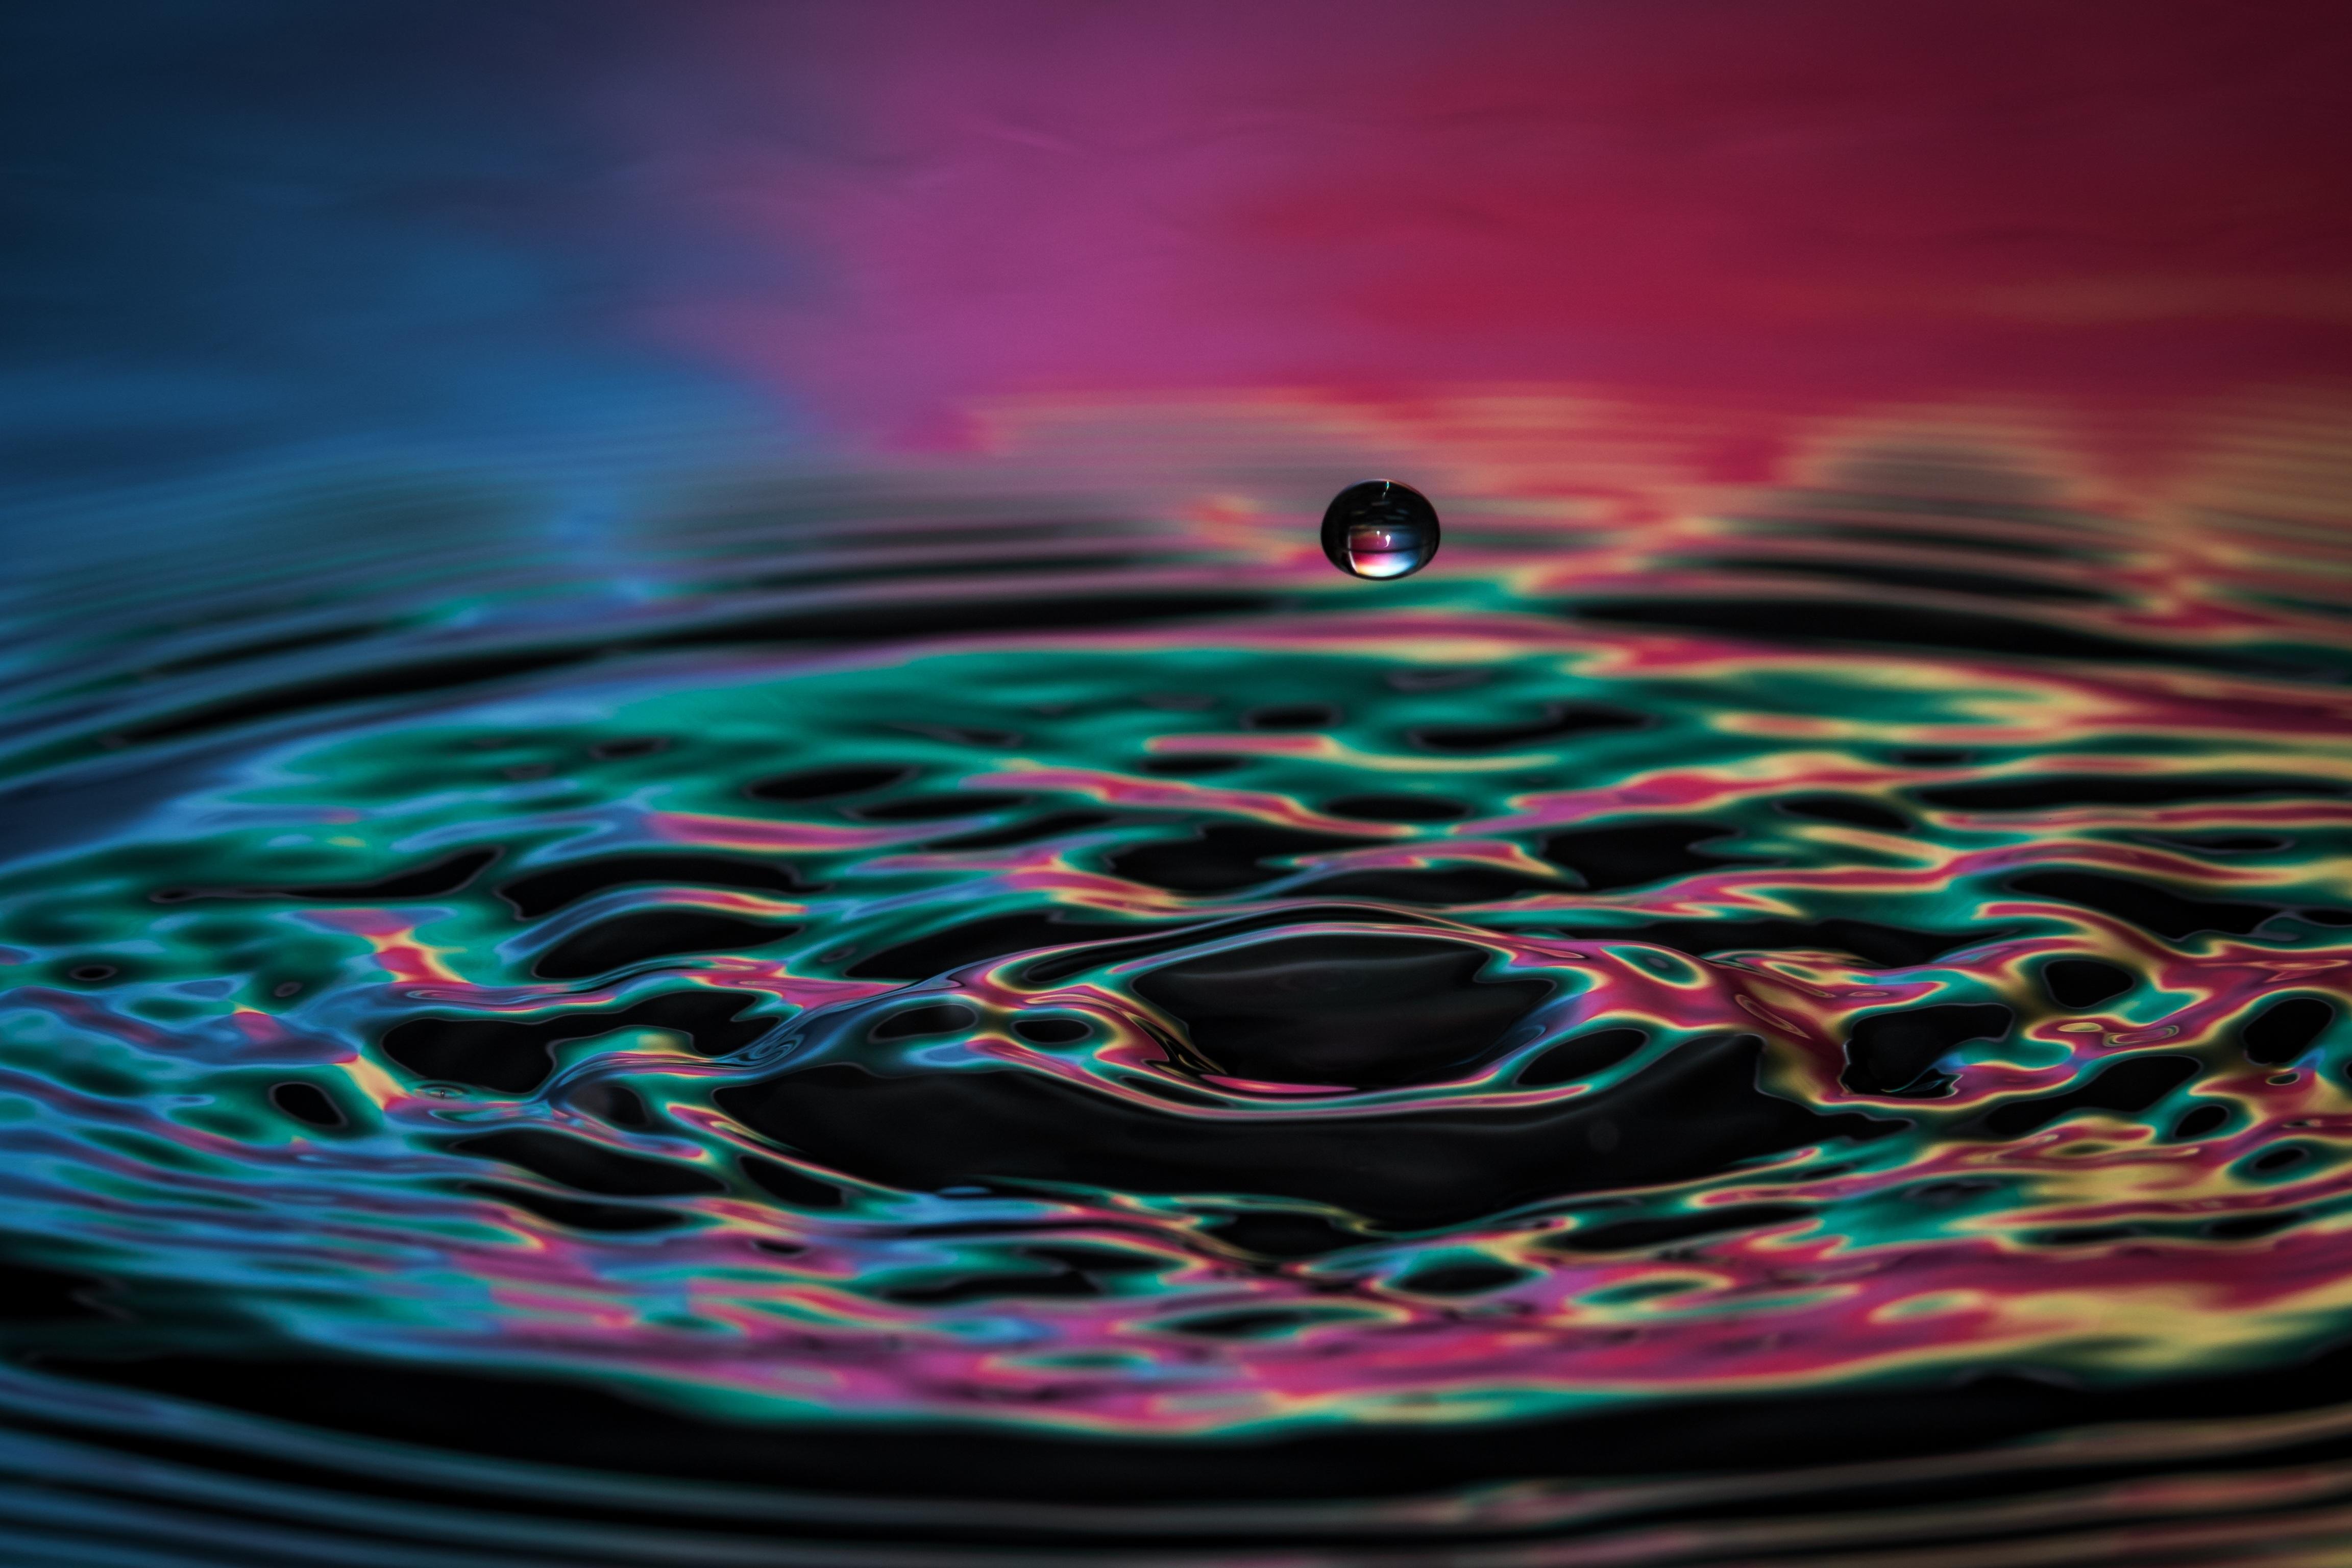 76541 download wallpaper Macro, Drop, Liquid, Spray, Color, Splash screensavers and pictures for free